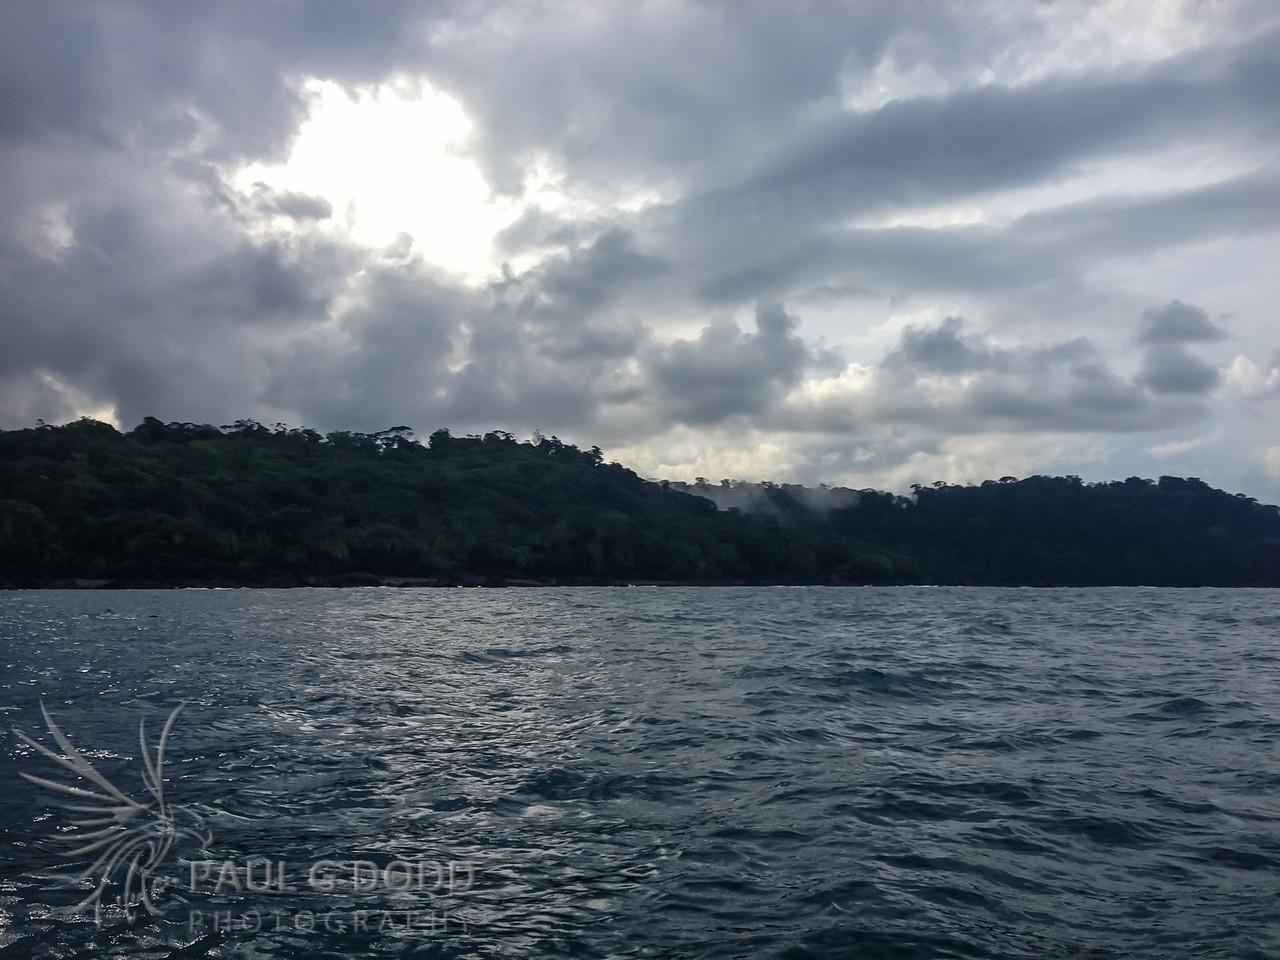 Drake Bay - where the rainforest meets the ocean